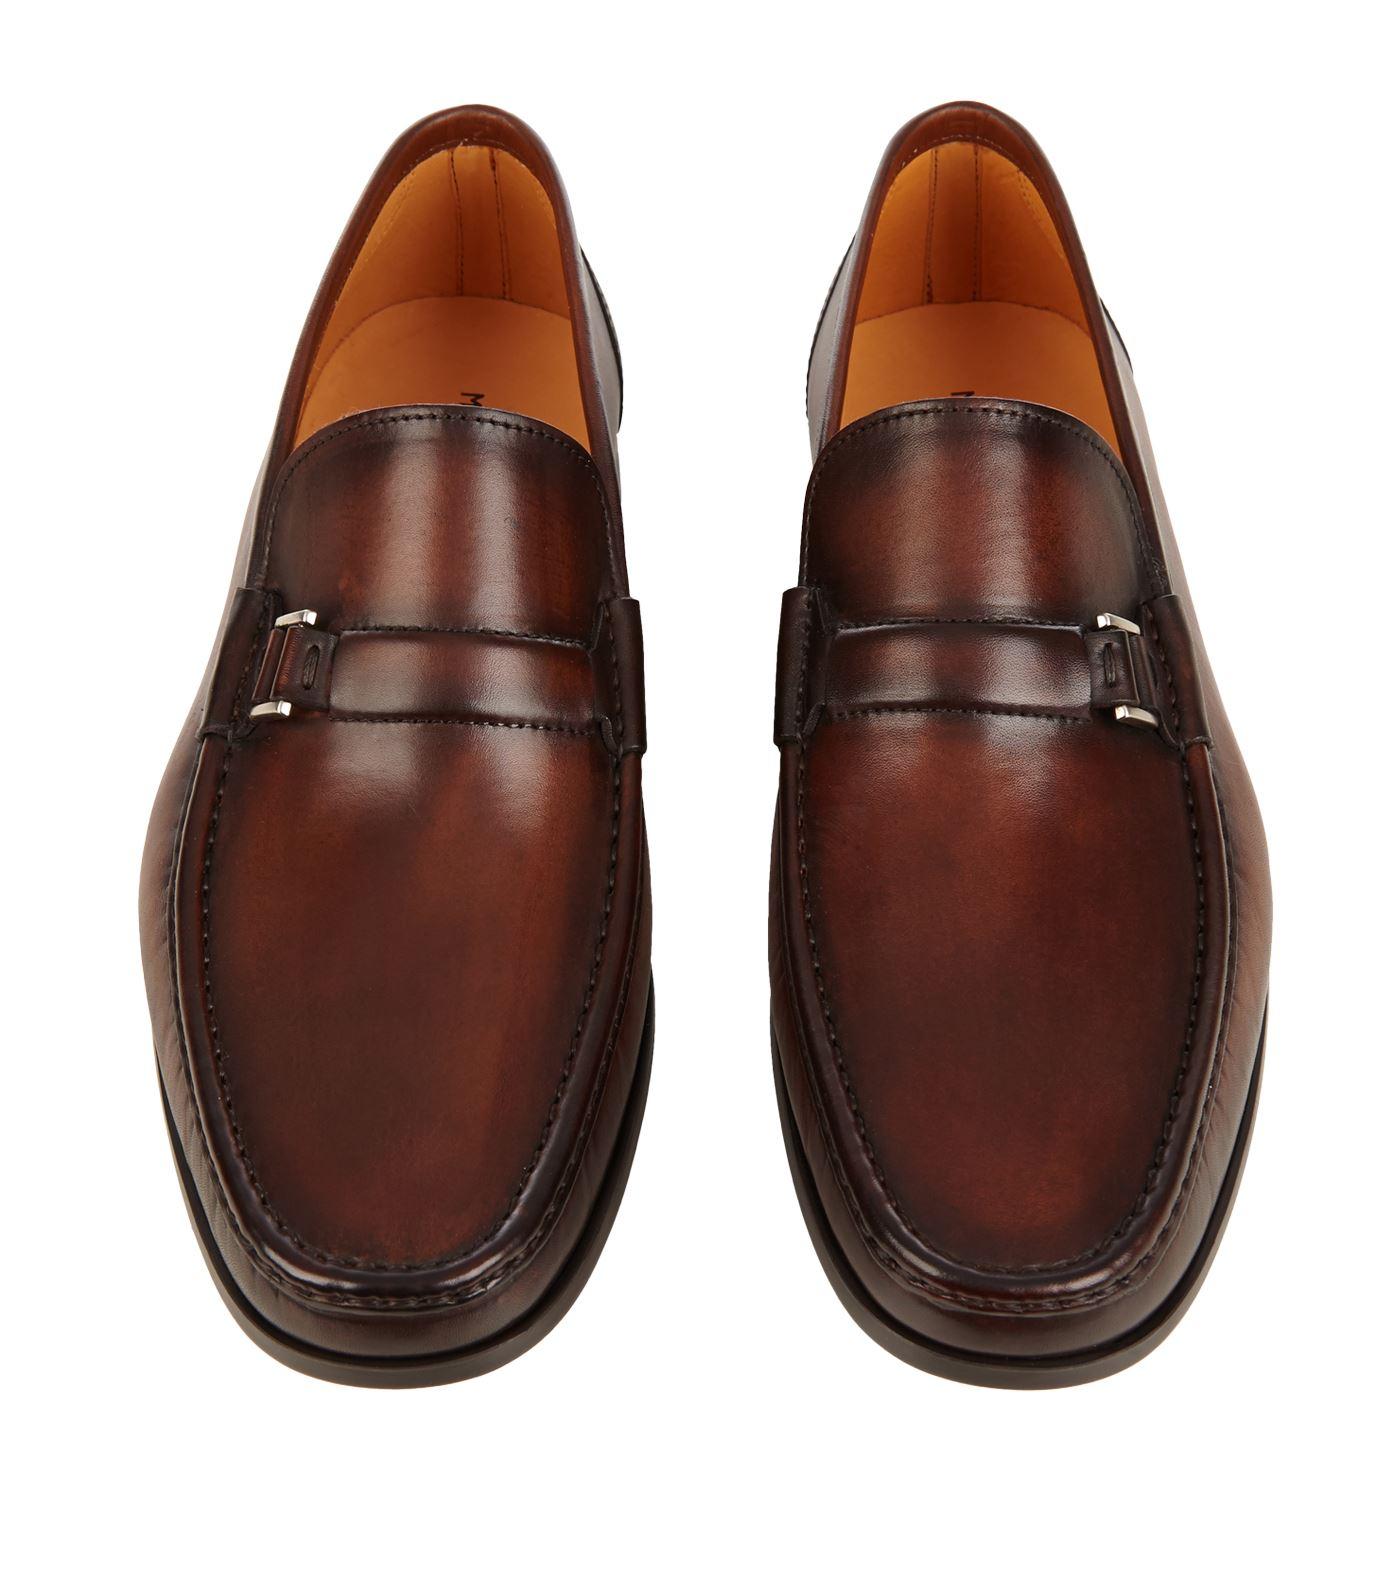 magnanni shoes ... shoes: loafers magnanni buckle detail penny loafer stvrrsm